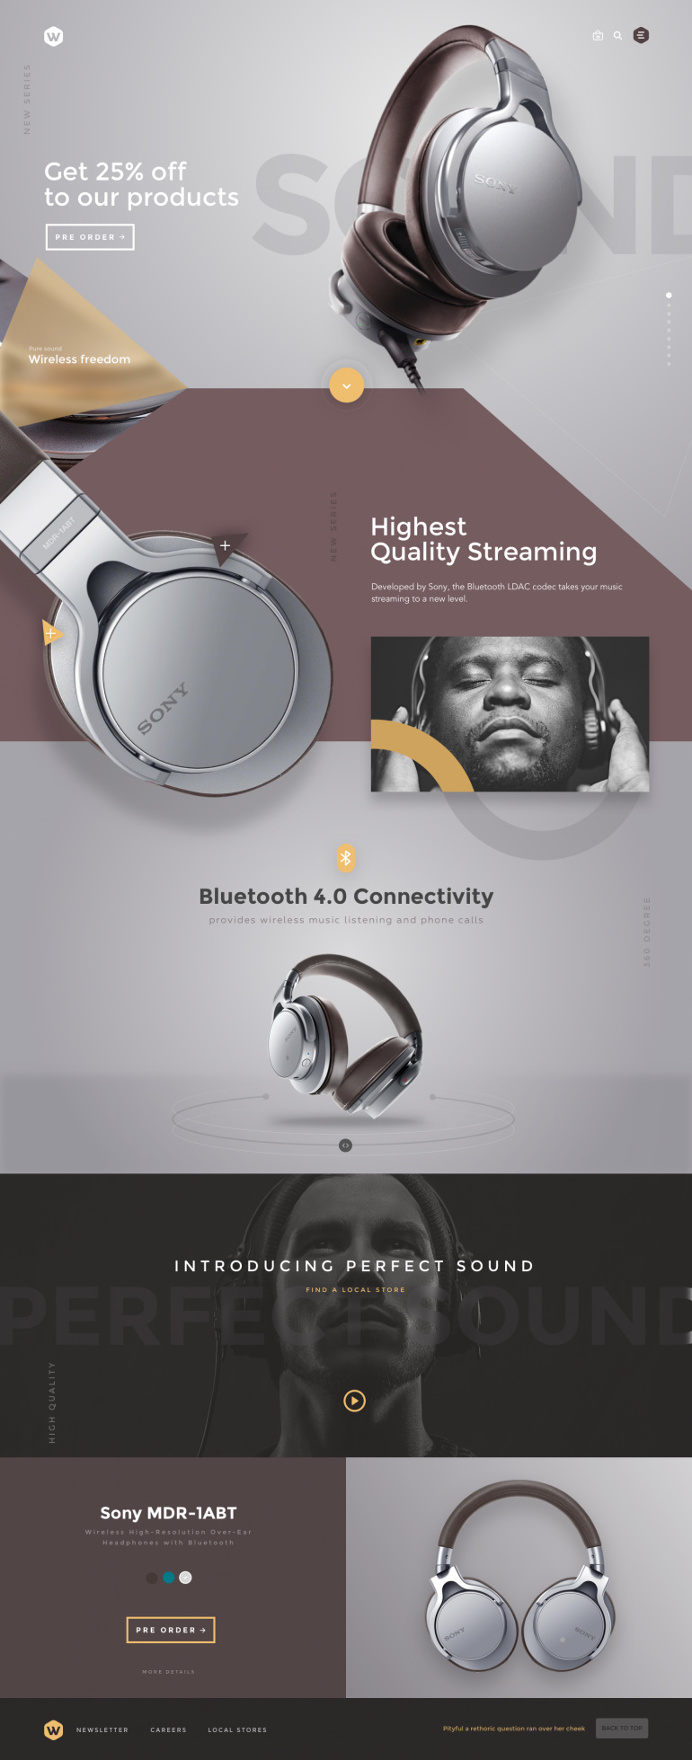 Headphones by Sencer in Web design